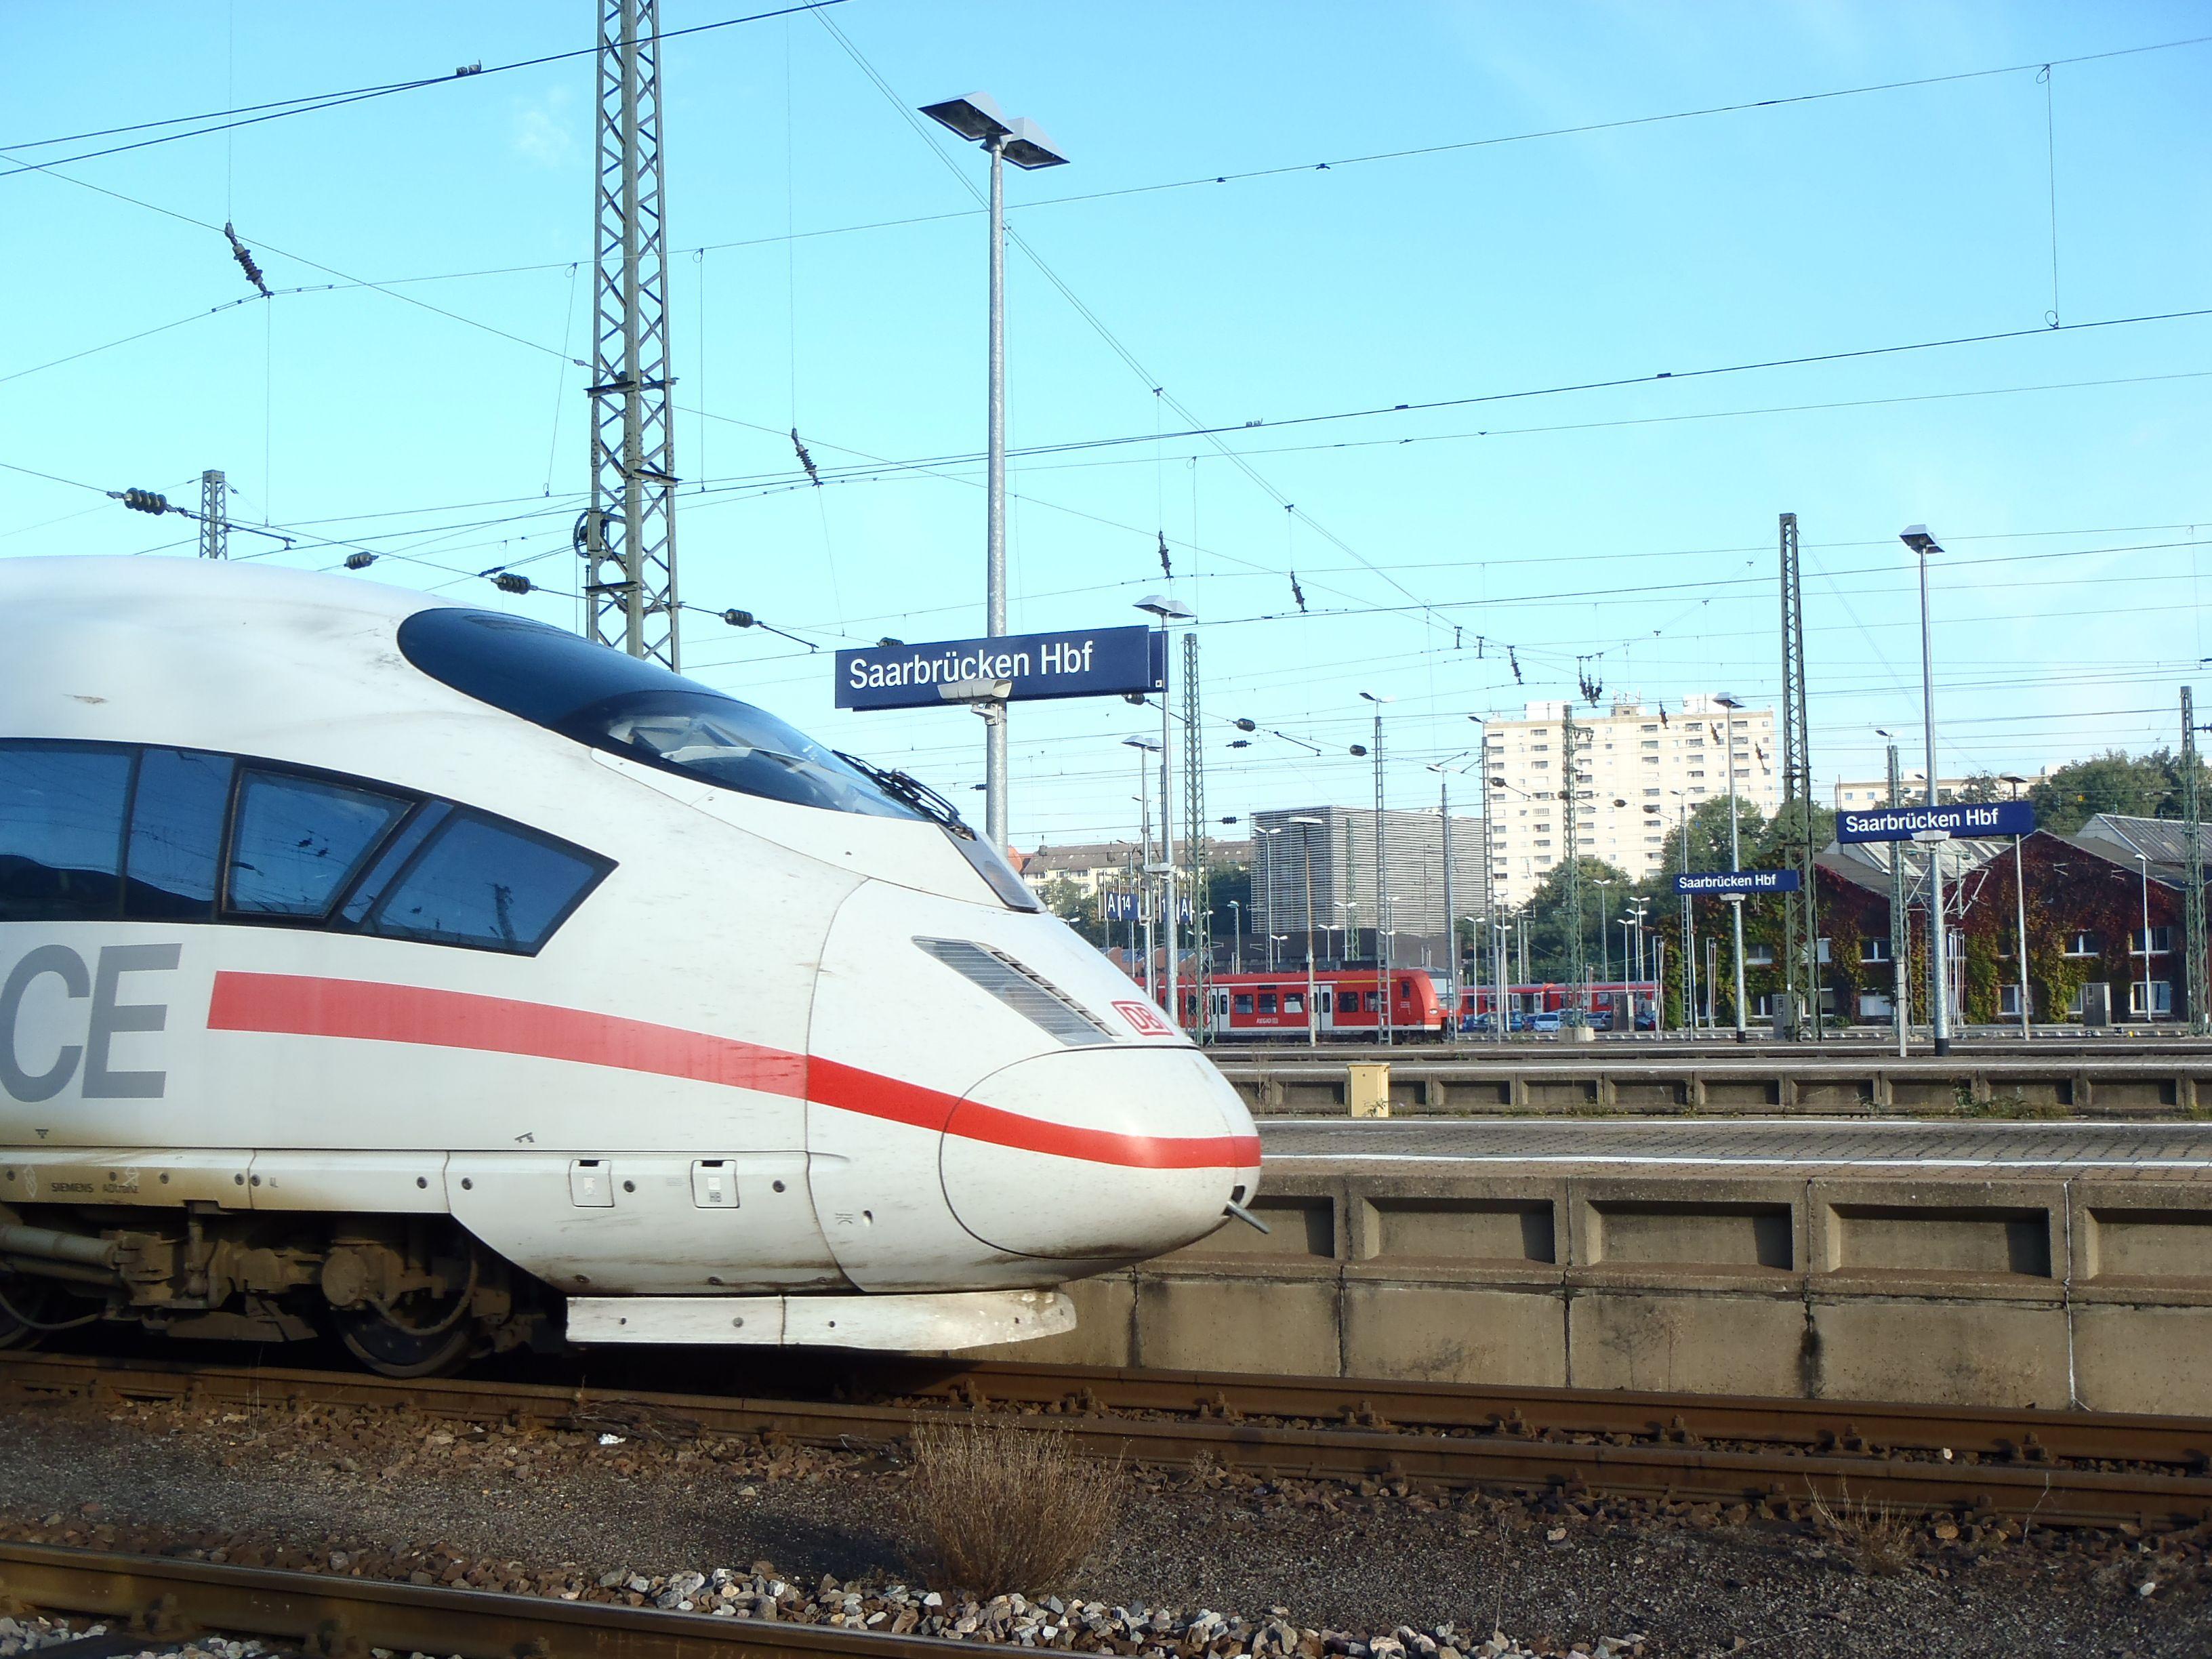 ICE am Bahnhof Saarbrücken